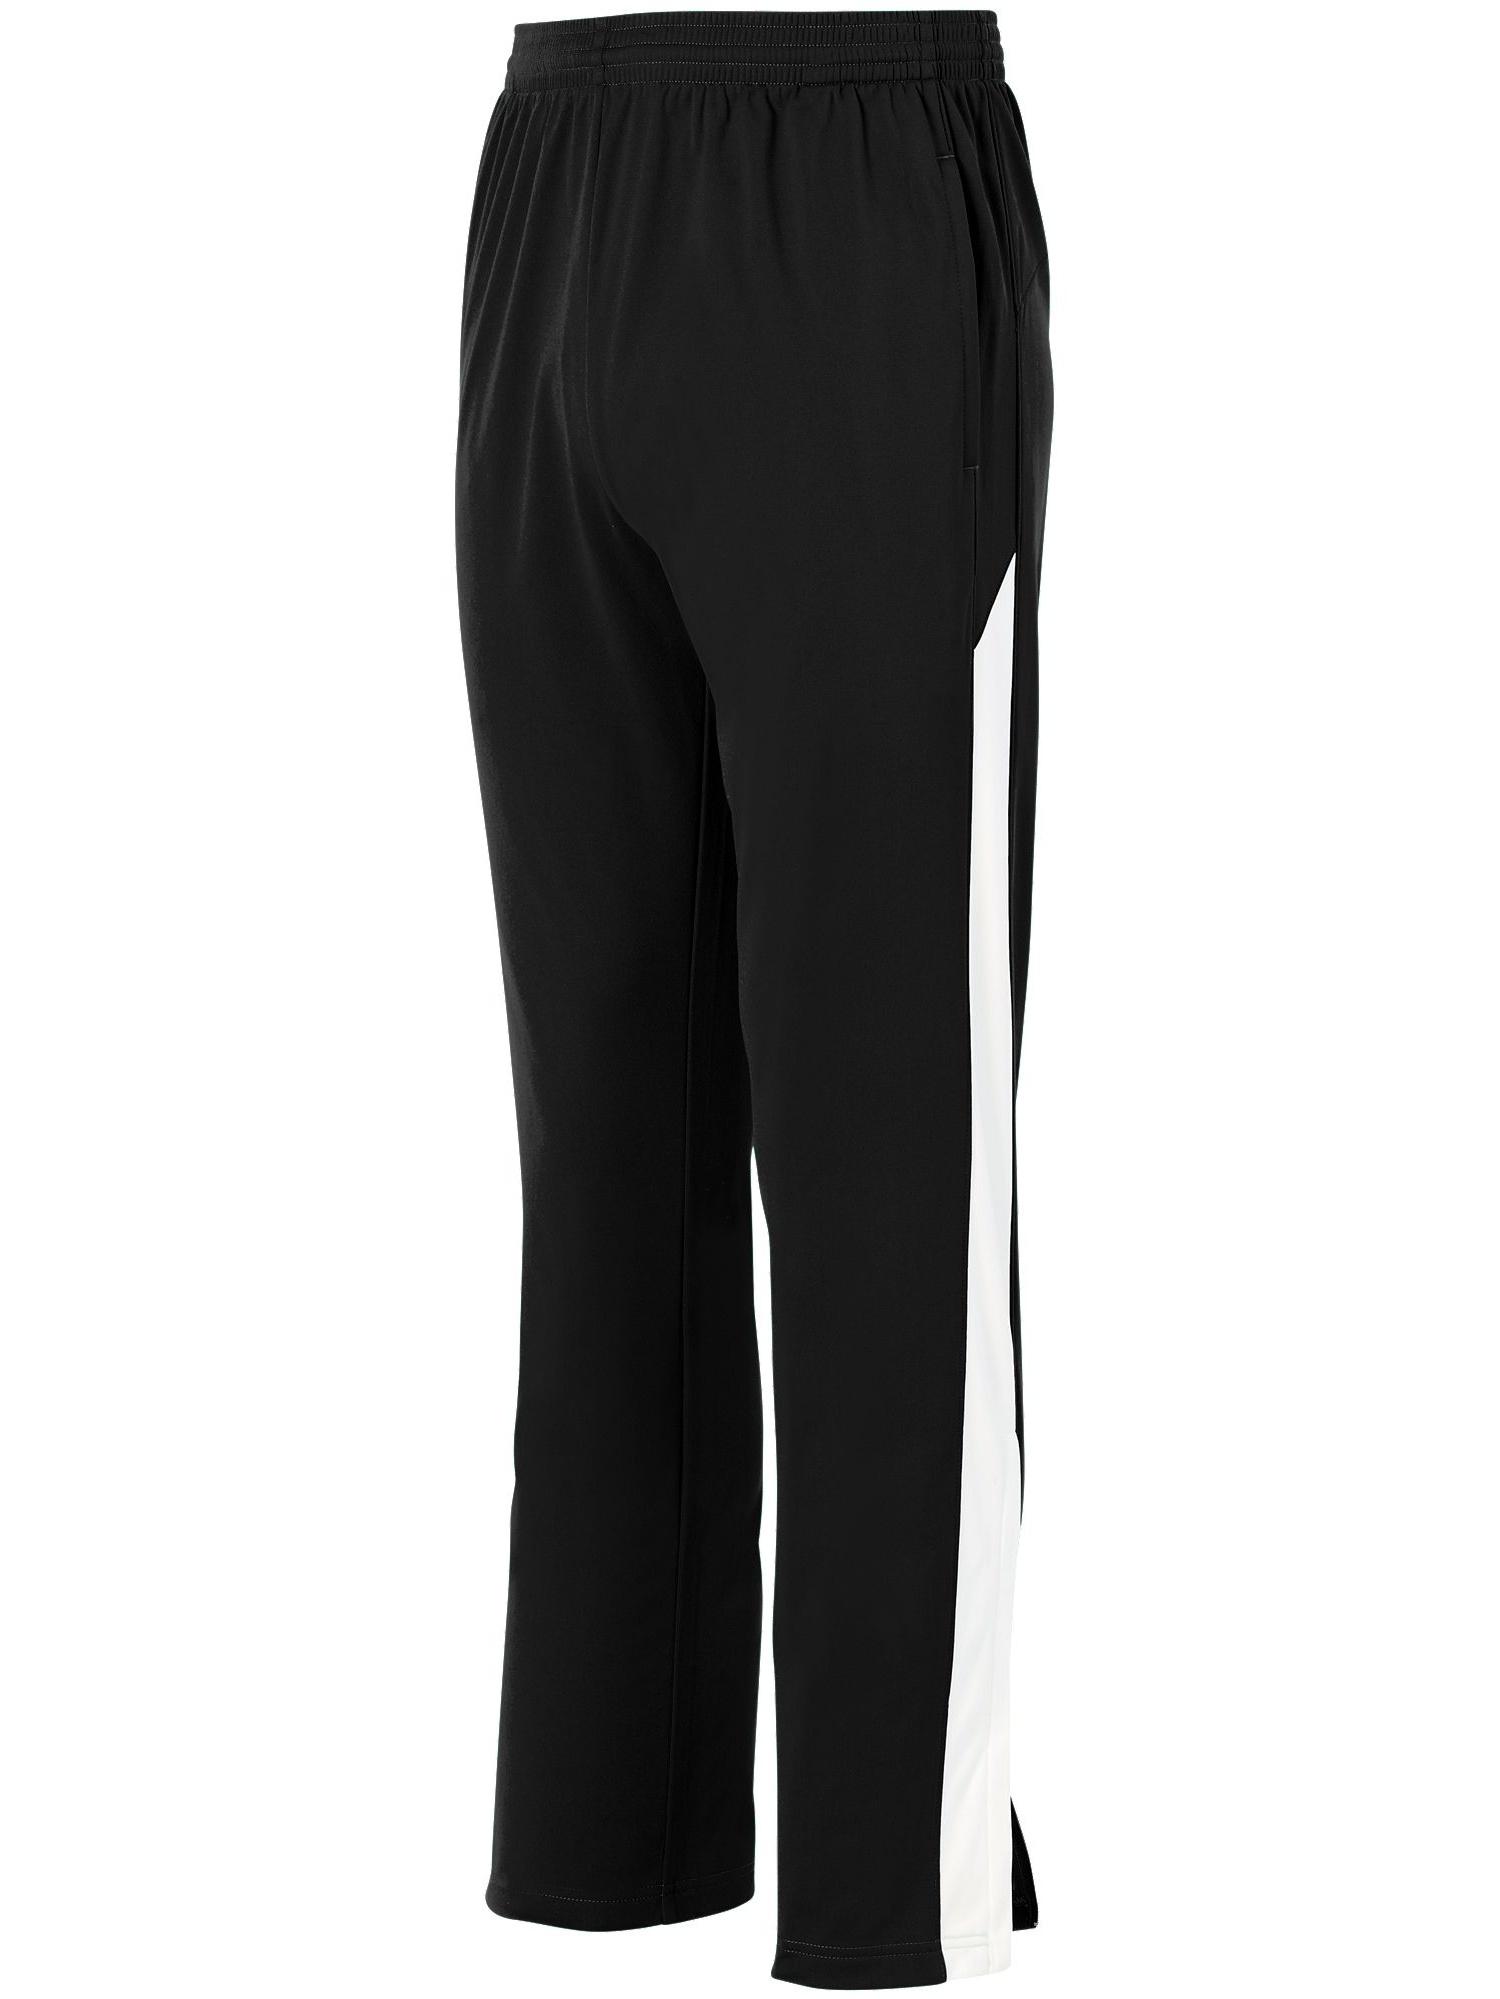 Augusta Sportswear Boys' Medalist Pant 2.0 7761